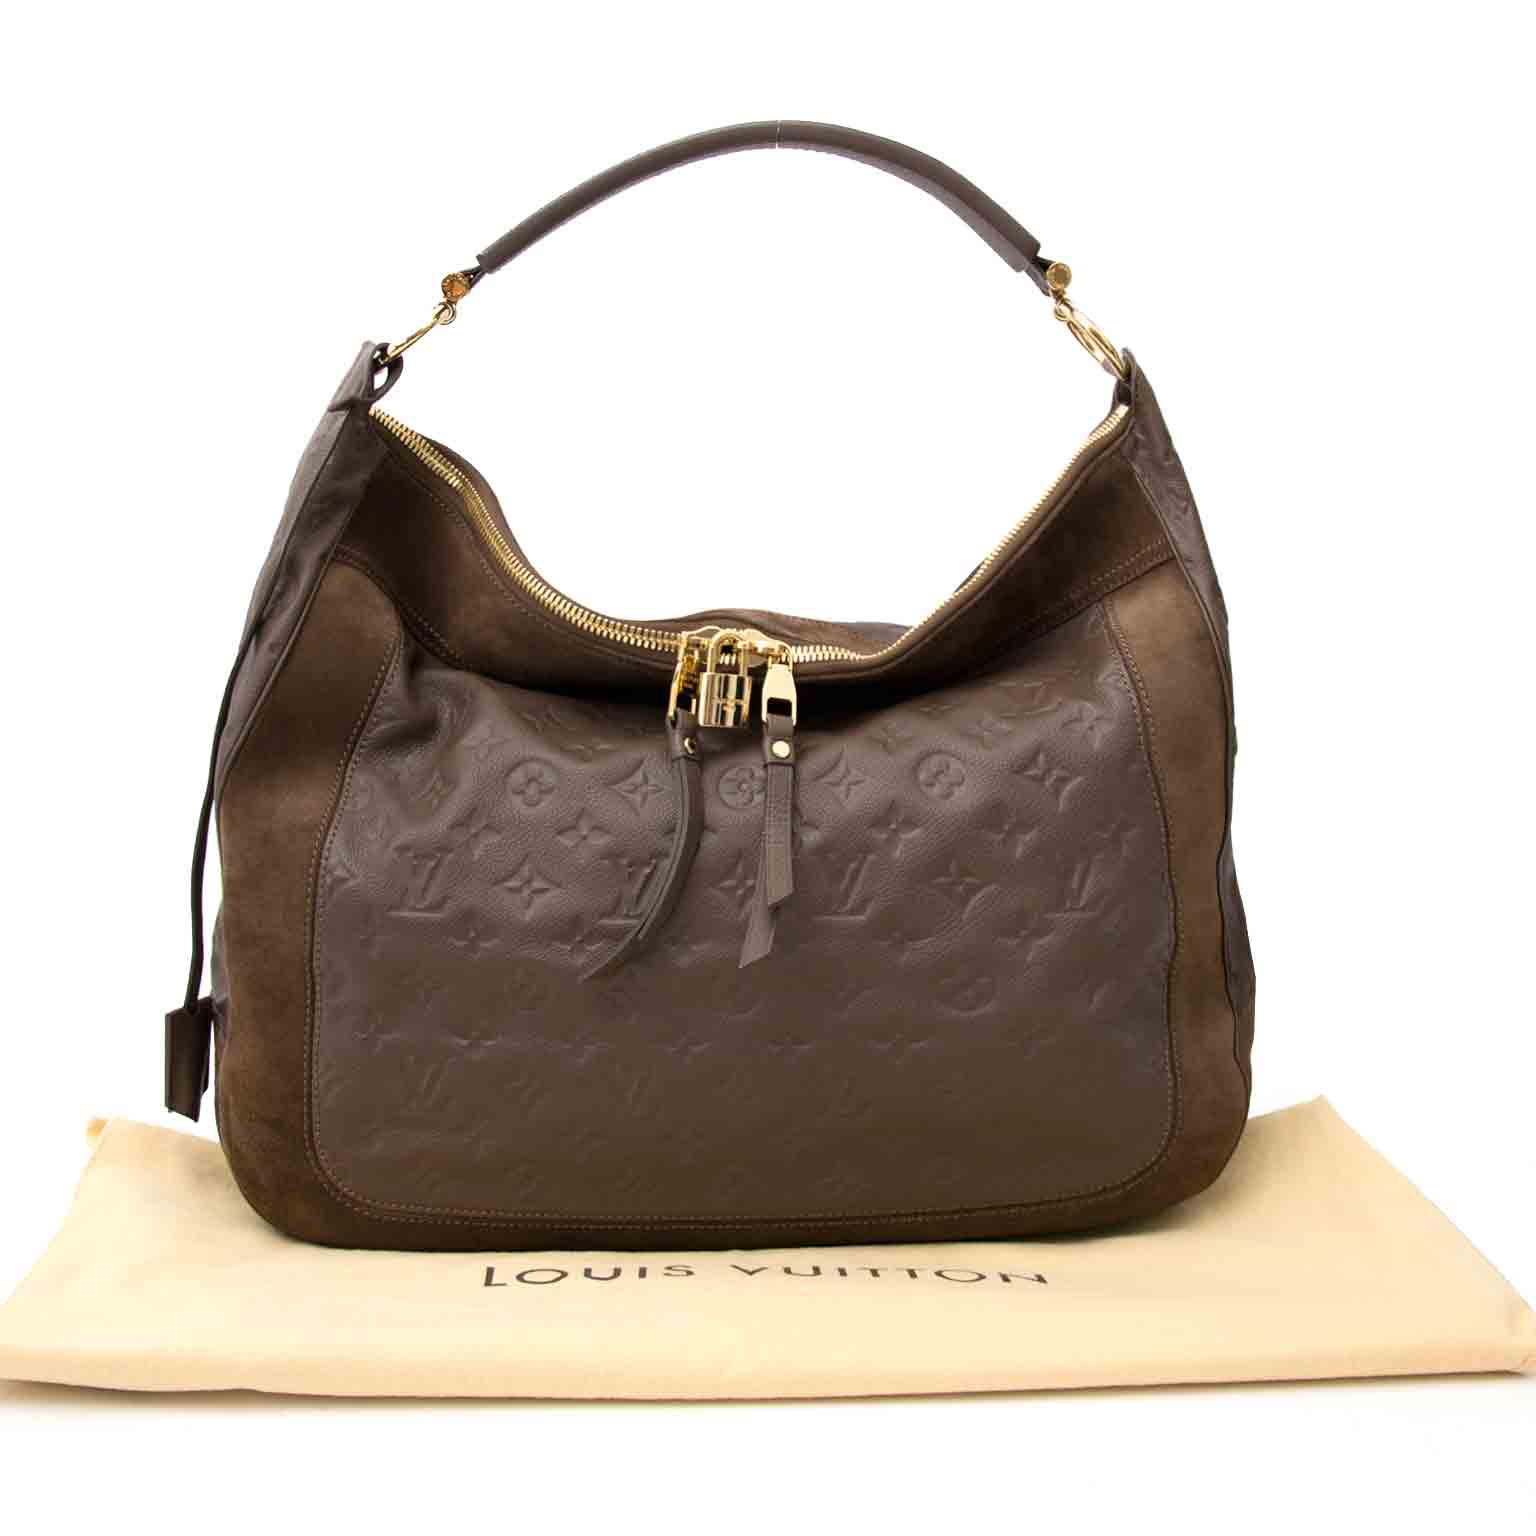 Acheter en ligne chez Labellov.com Louis Vuitton Brown Audacieuse Empreinte  GM Bag 696125cf969ee